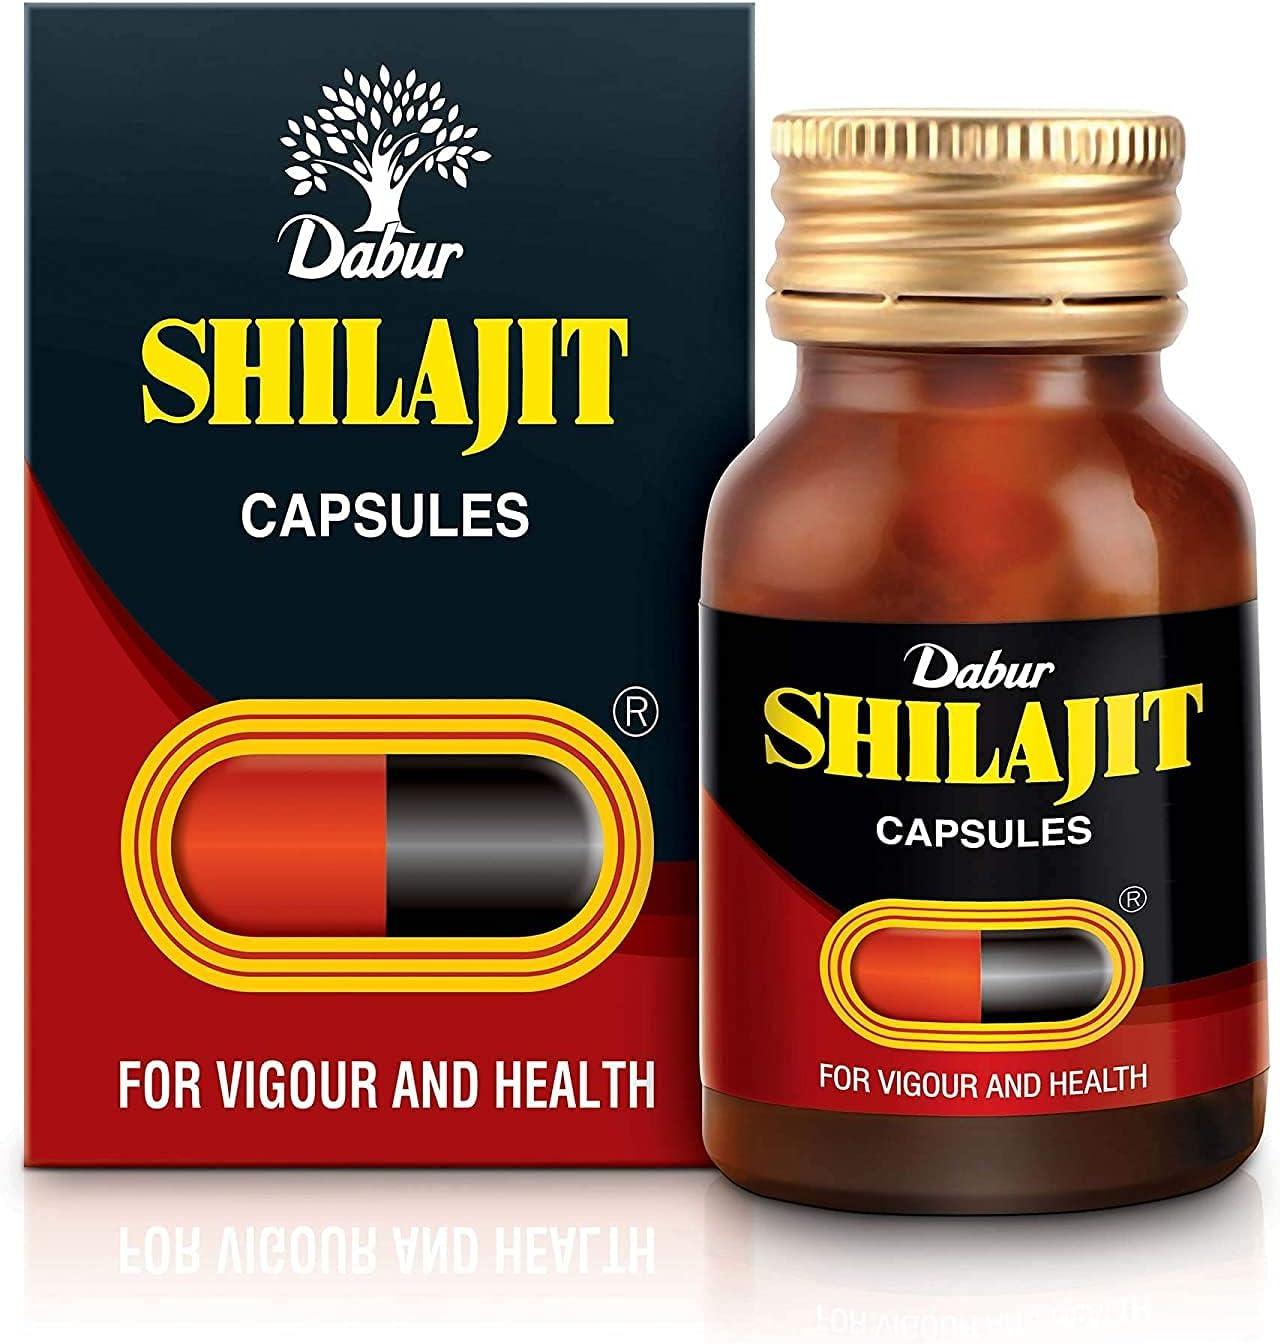 Madow Shilajit Capsules Ayurvedic Purified Antifat with Ranking Trust TOP15